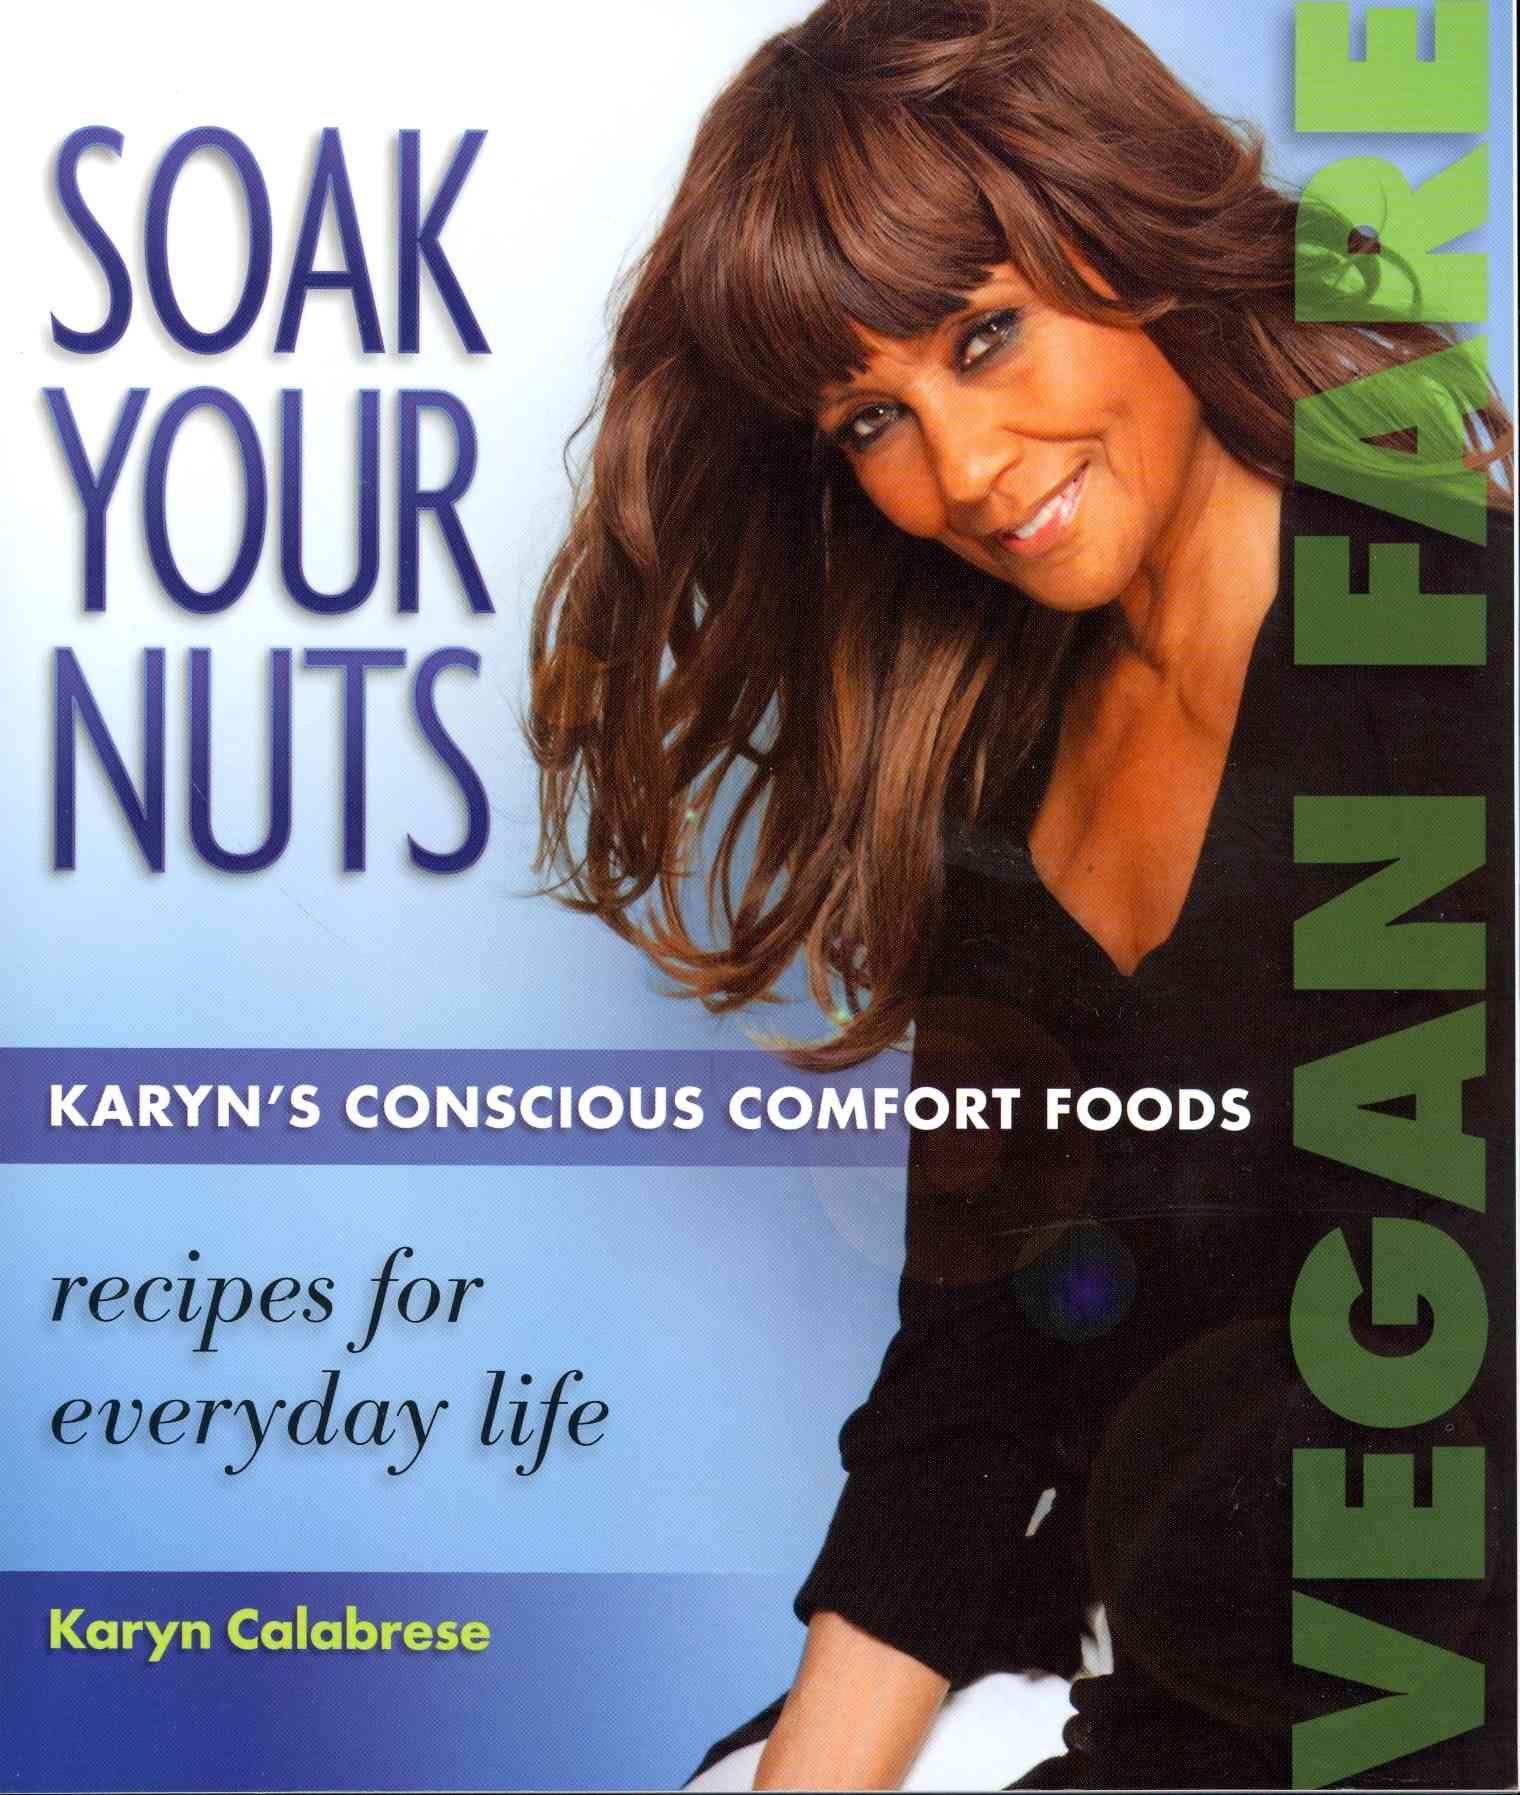 Soak Your Nuts: Karyn's Conscious Comfort Foods, Vegan Fare, Raw Recipes (Paperback)